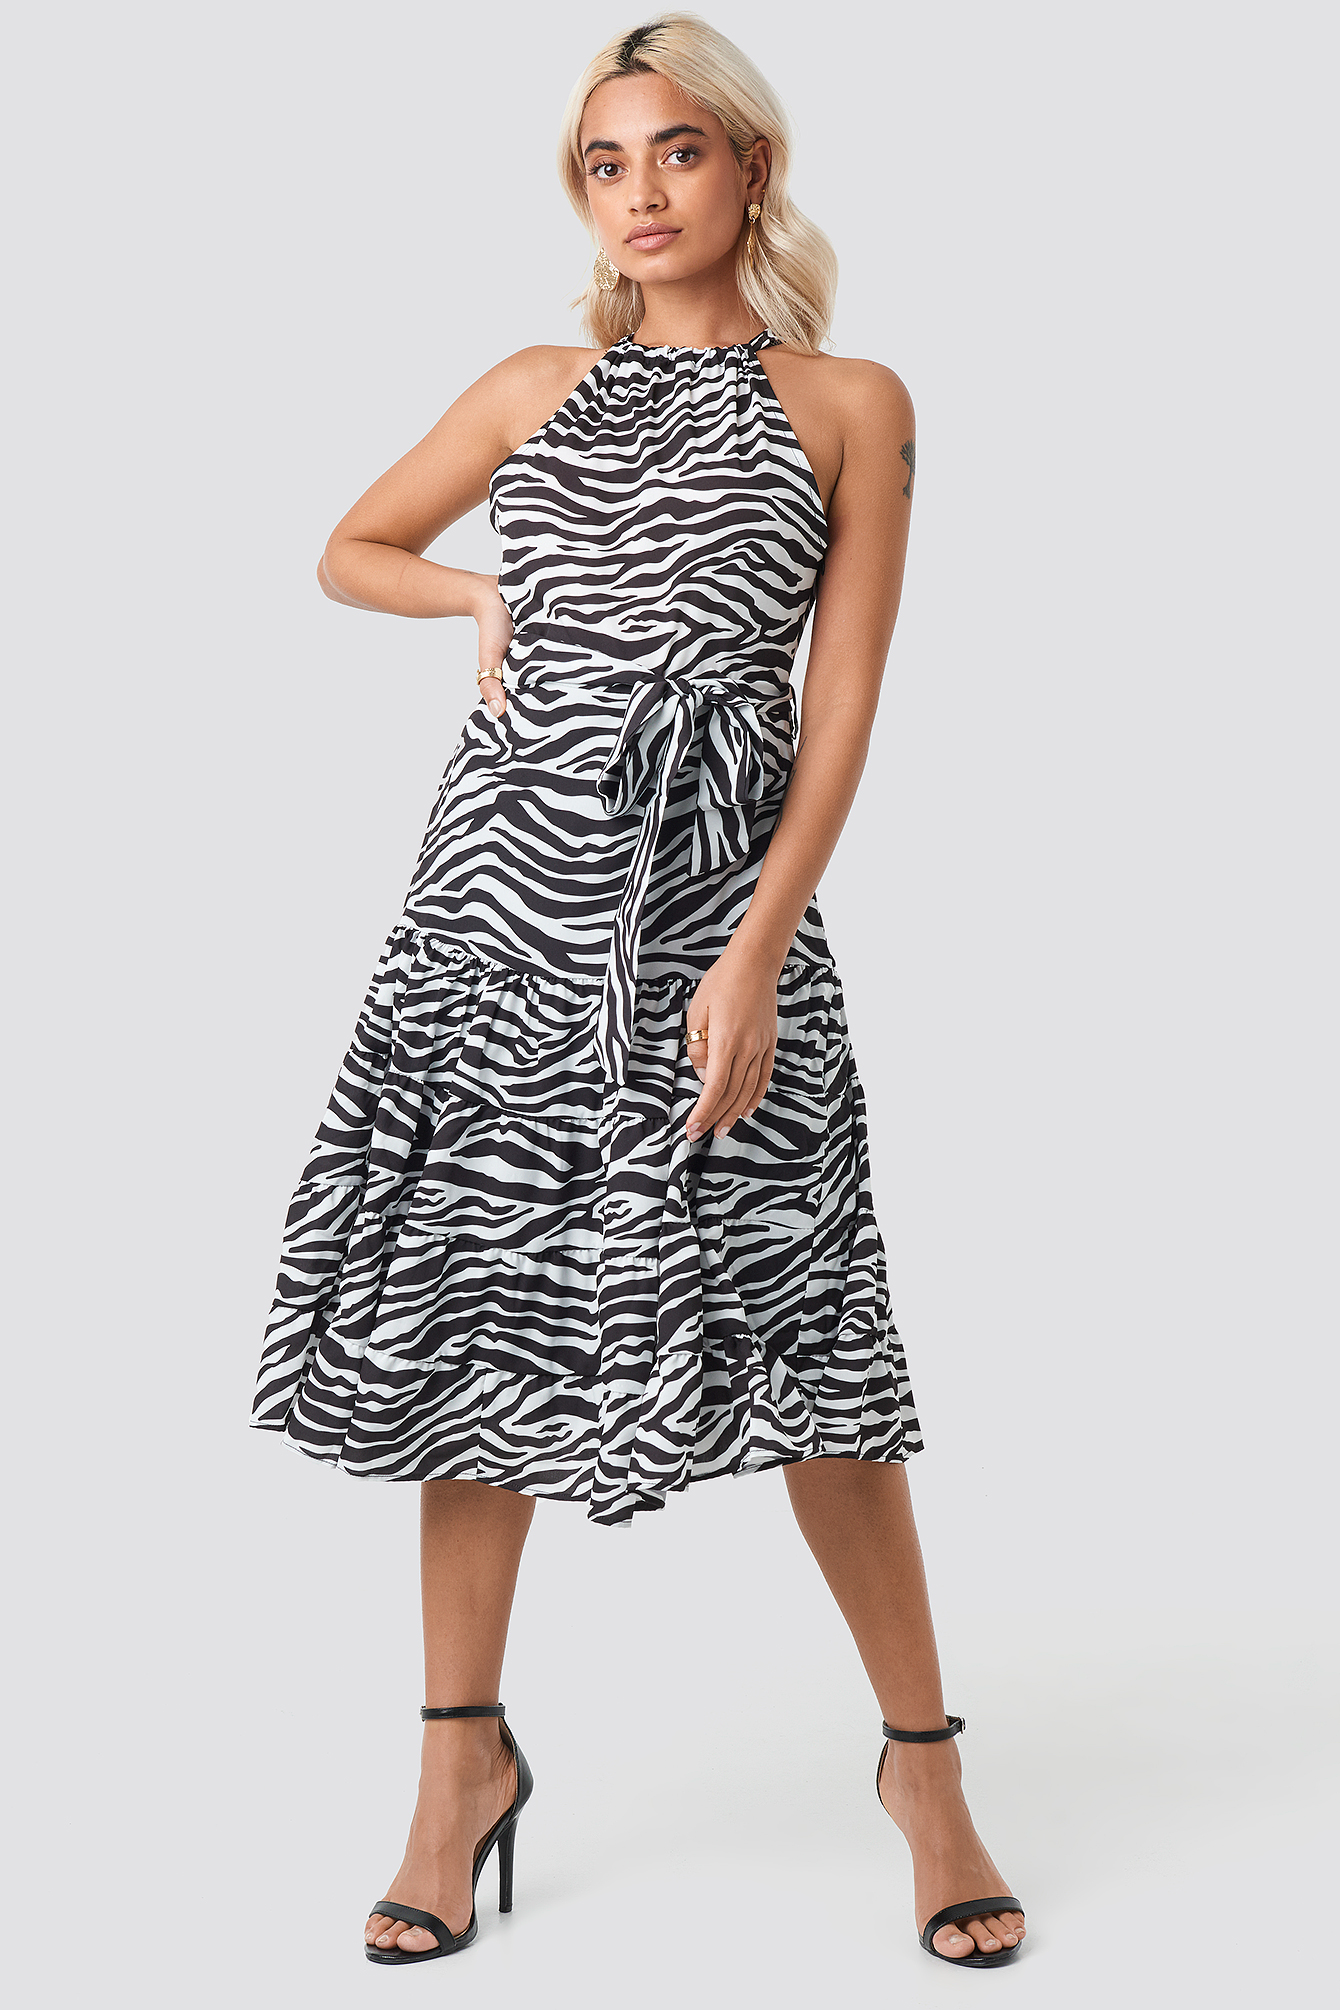 trendyol -  Animal Print Midi Dress - Black,White